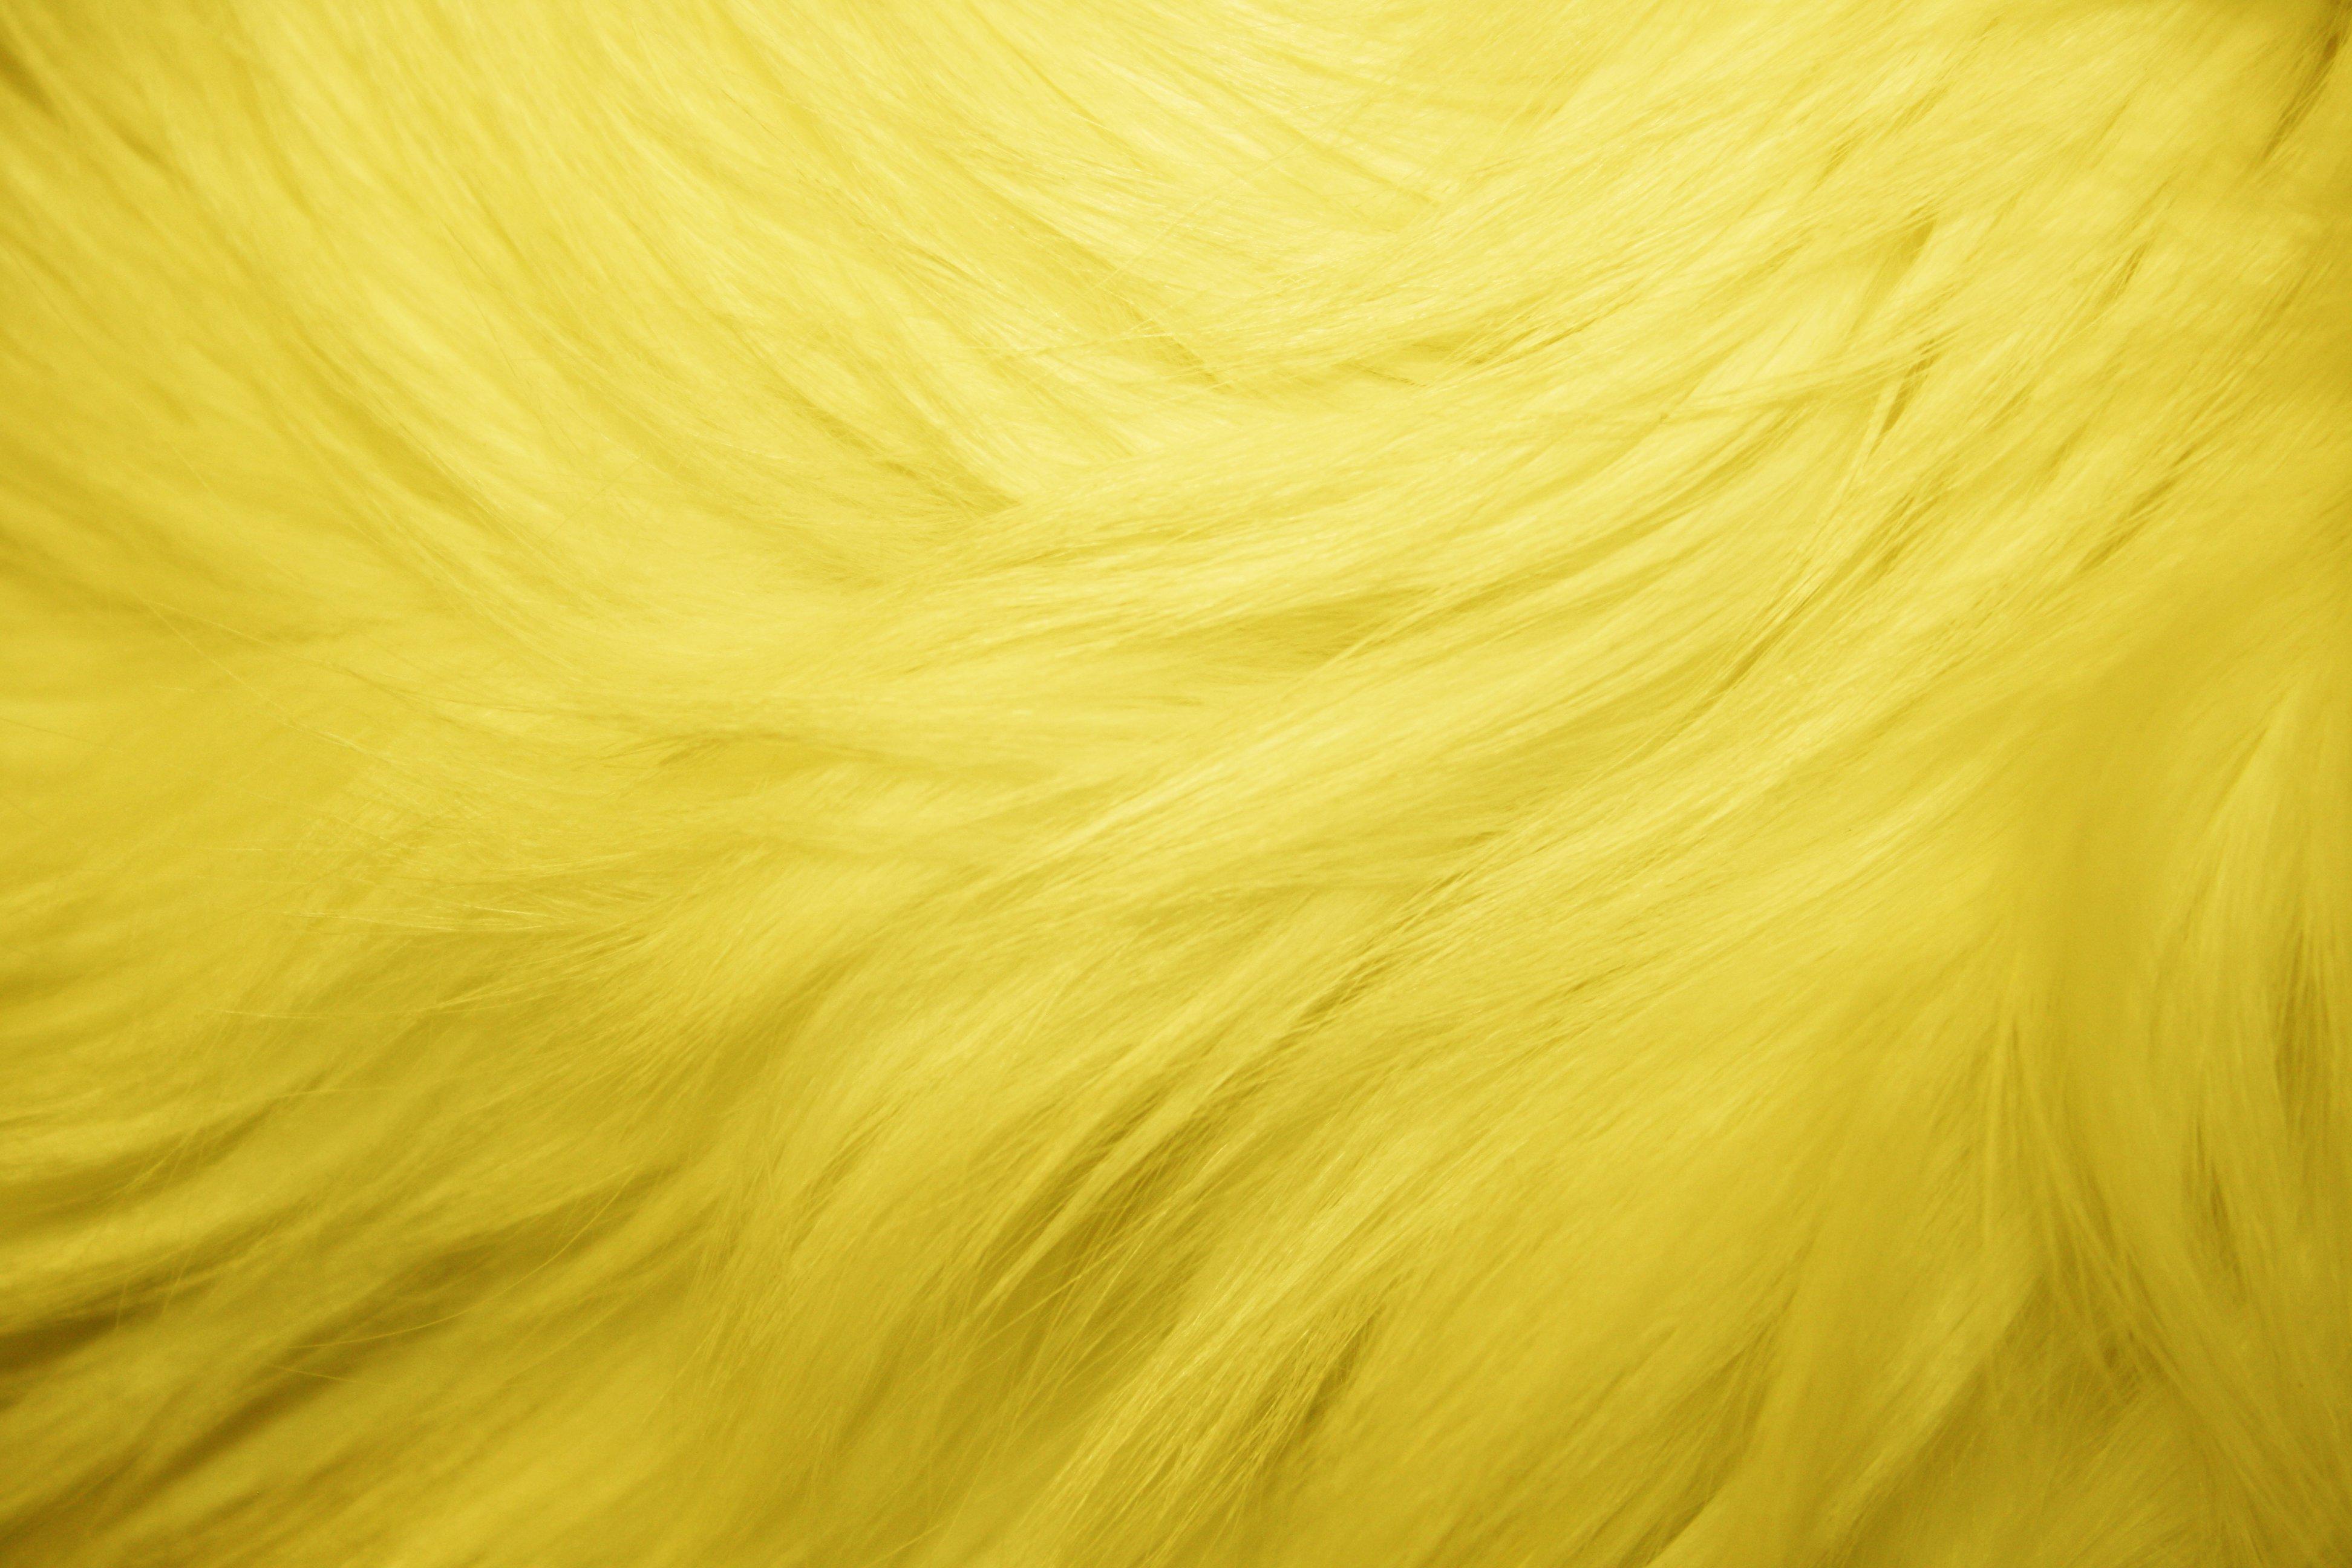 Yellow Fur Texture Picture | Free Photograph | Photos Public Domain